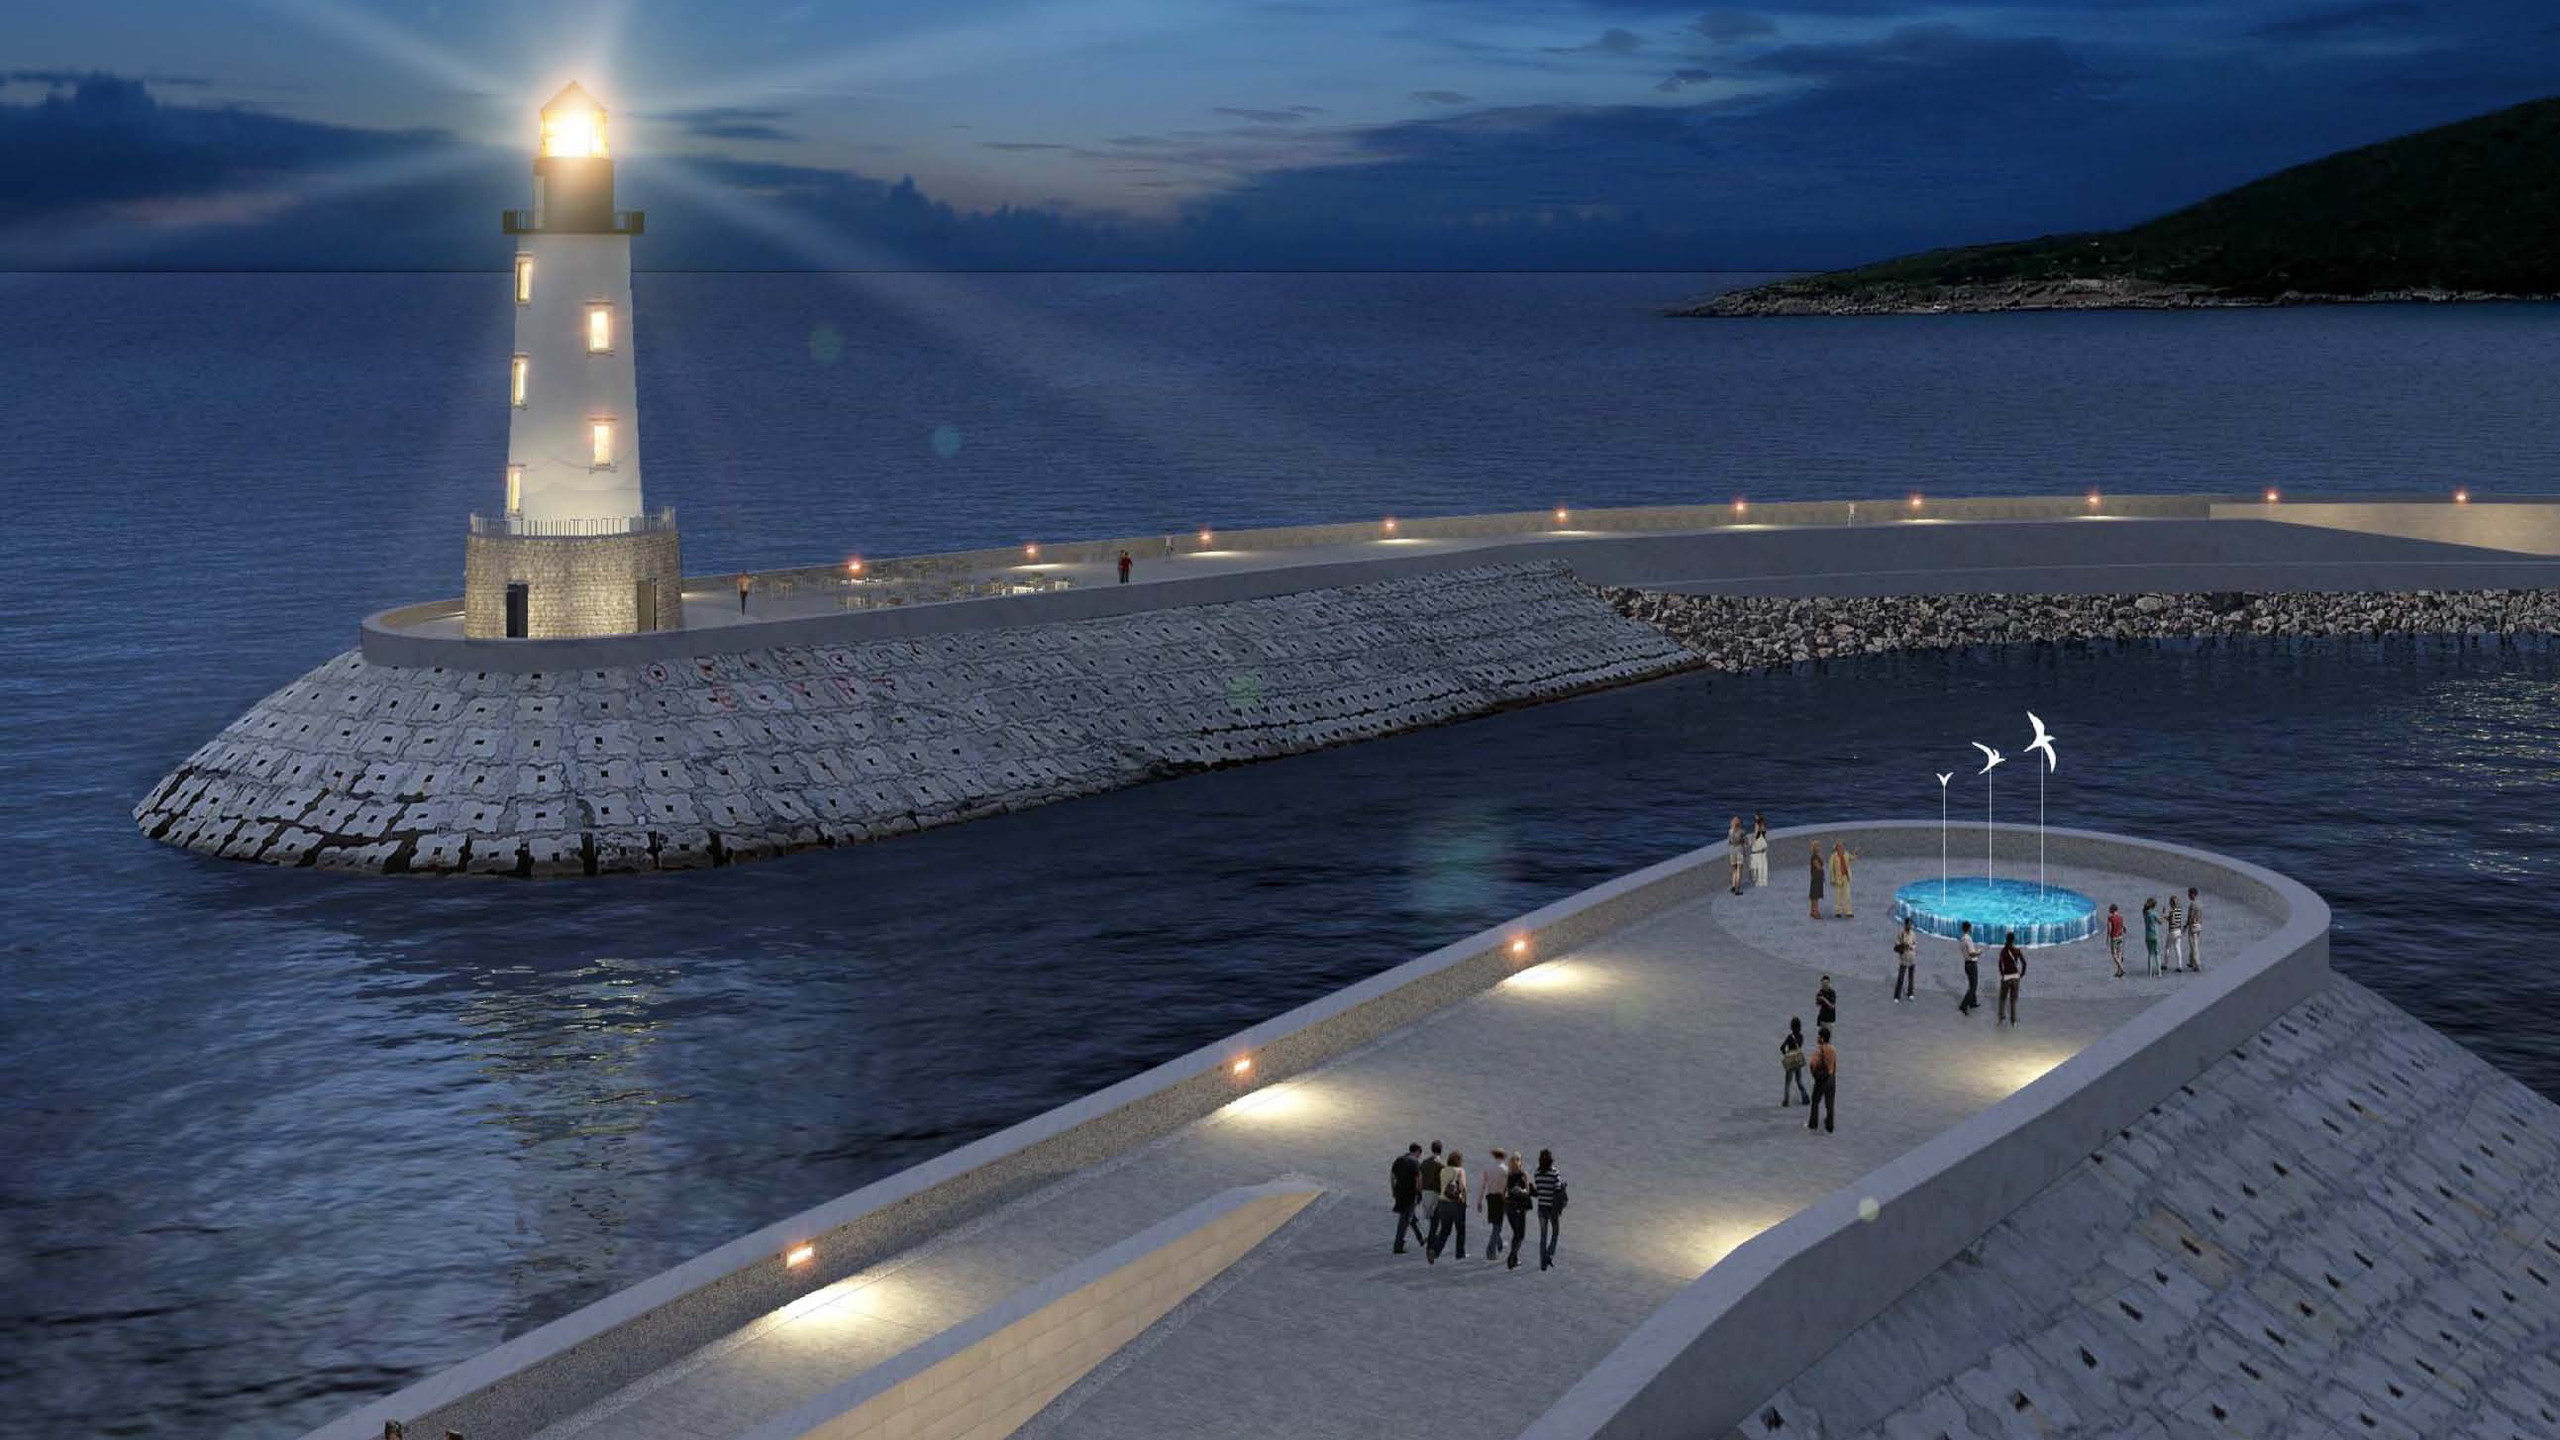 Lustica Bay 12